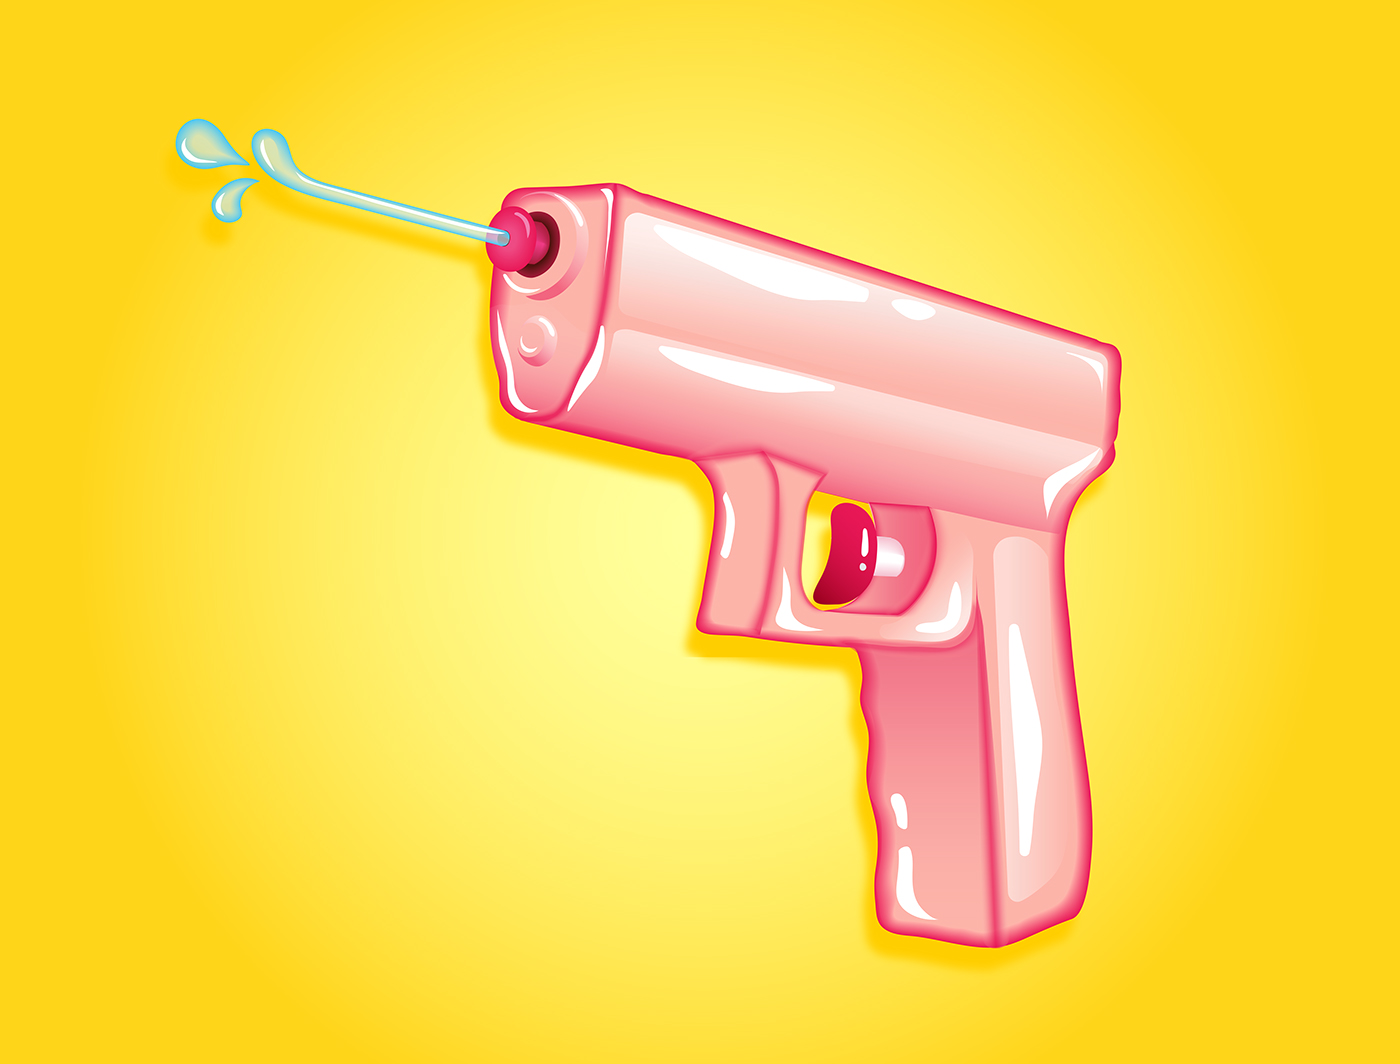 Emoji apple peach Dating app texting messaging face